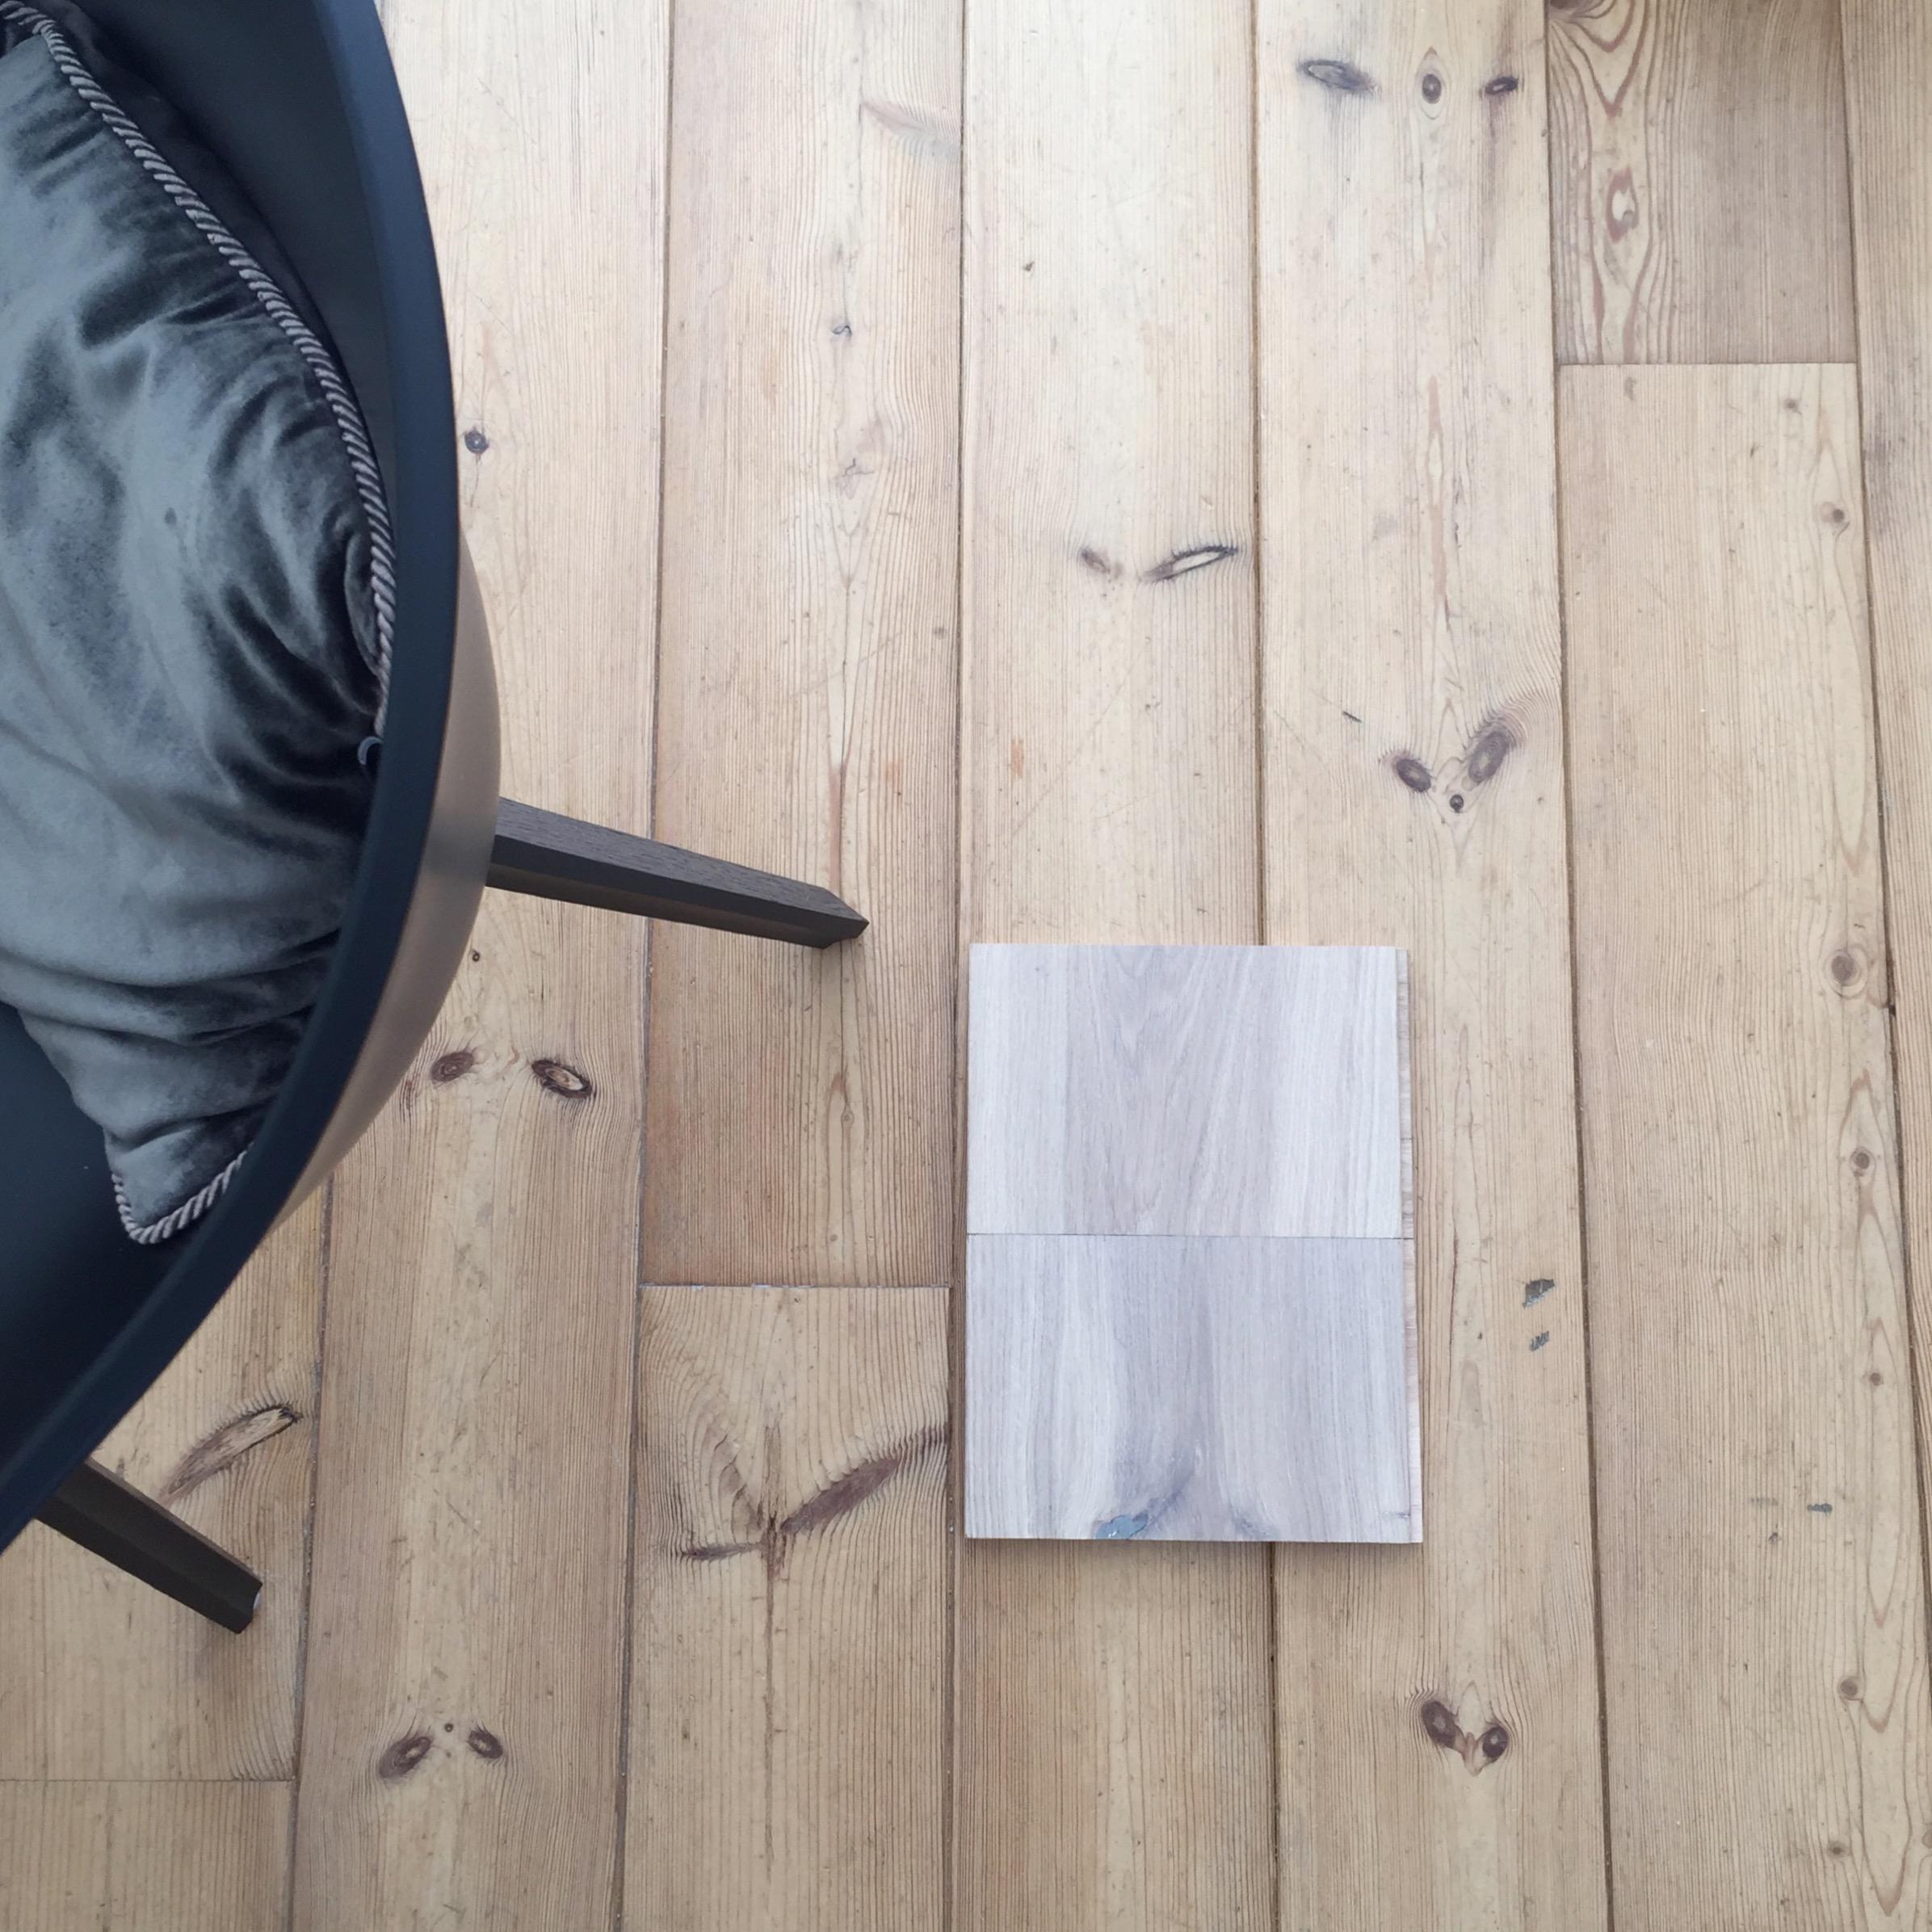 selinesteba.com - Nieuwe vloer Seline Steba.JPG